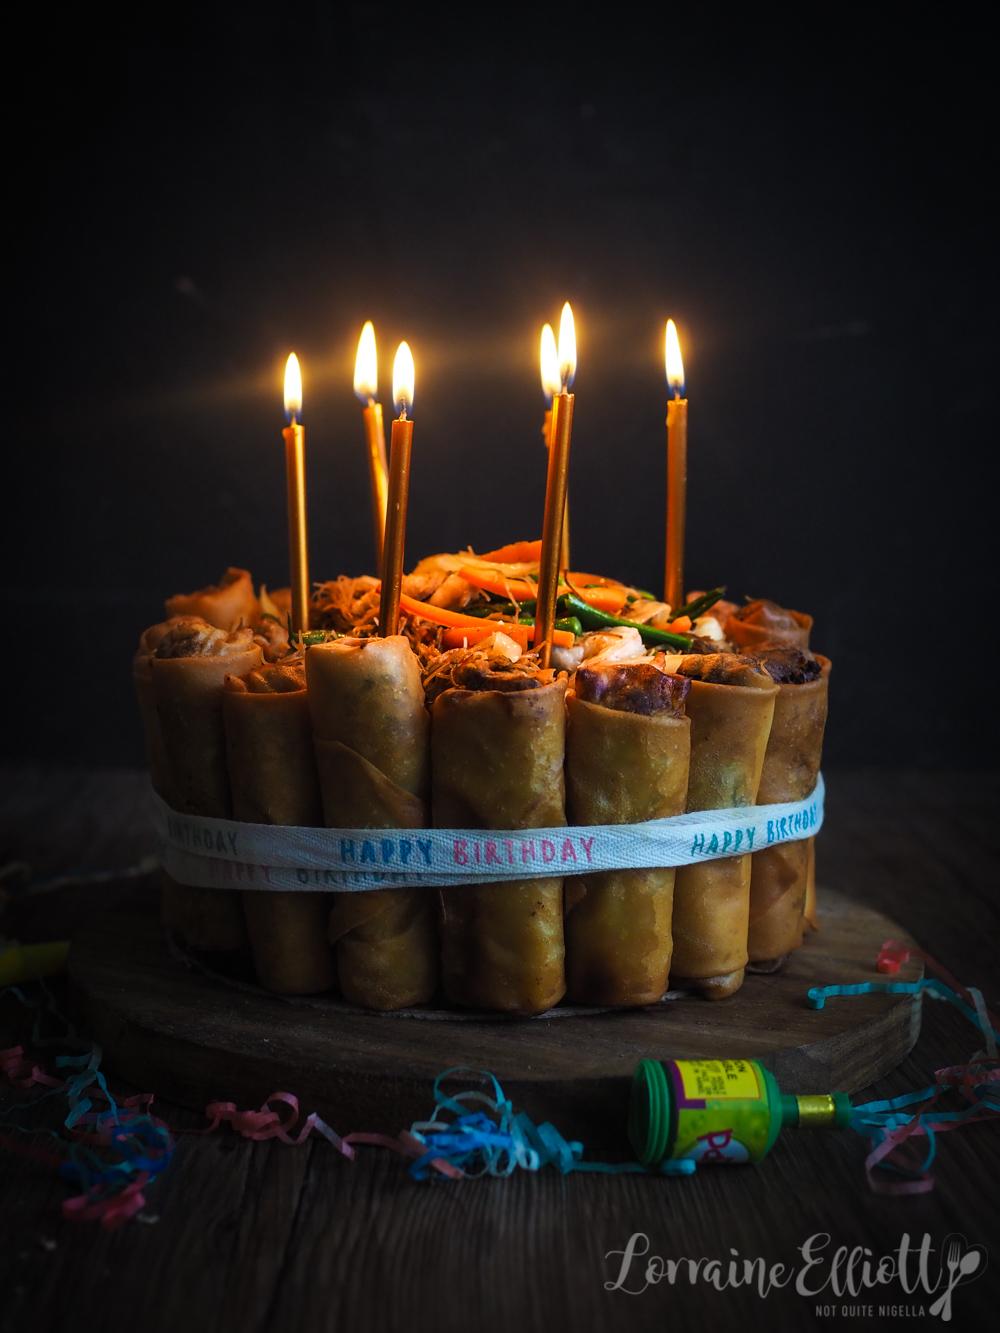 Pancit Lumpia Savoury Birthday Cake With Spring Rolls & Noodles